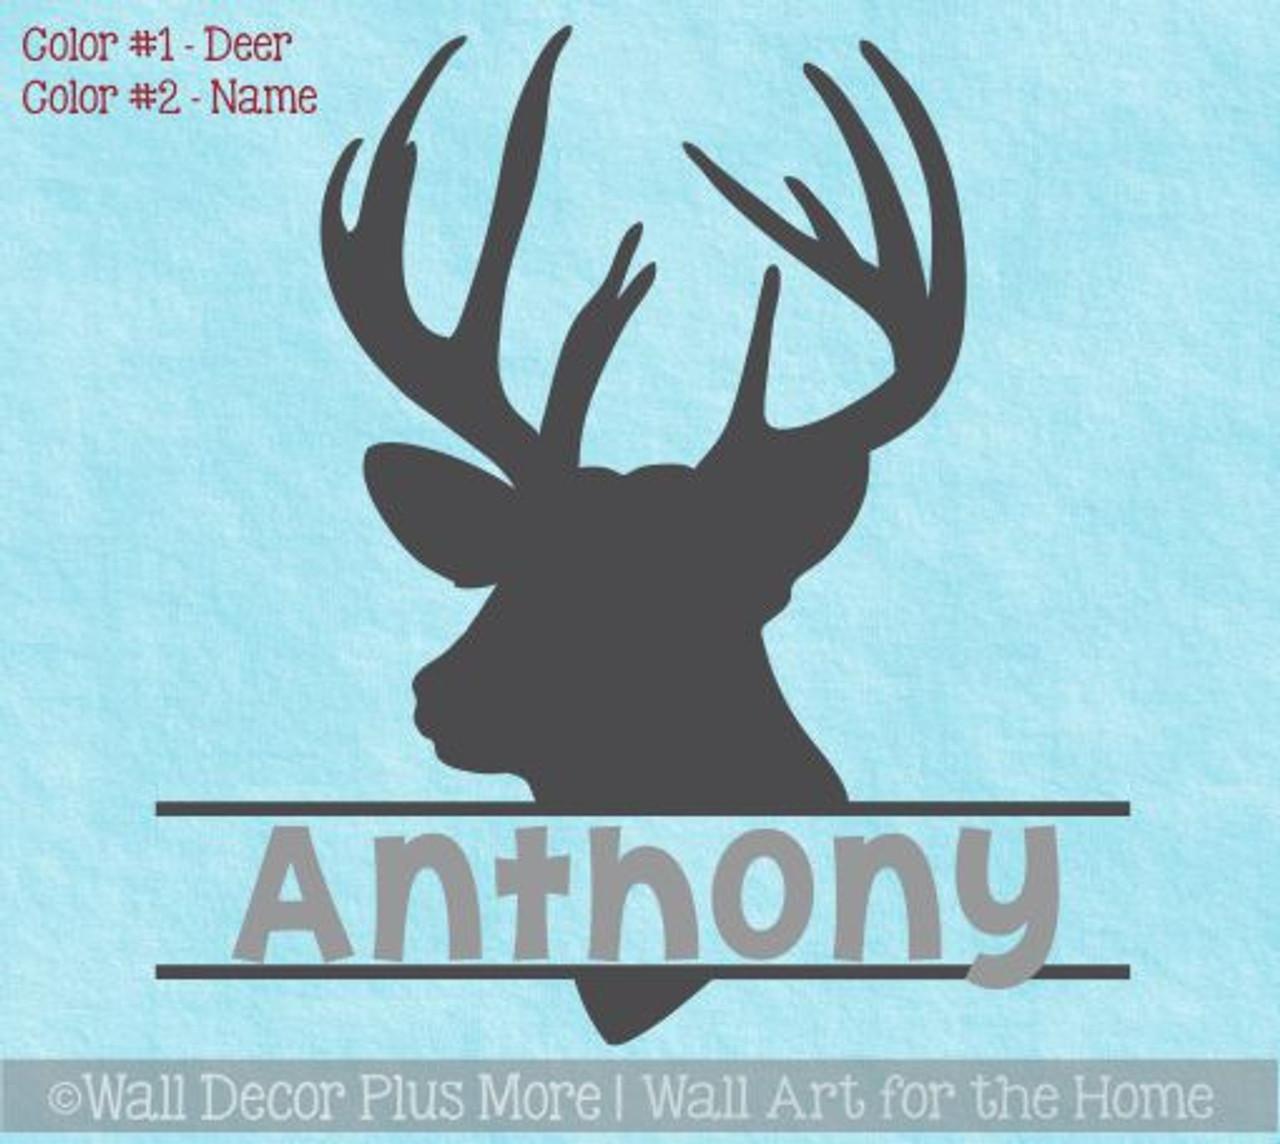 Deer Antler Wall Sticker Inspiration Hunting Vinyl Kids Bedroom Removable Decor